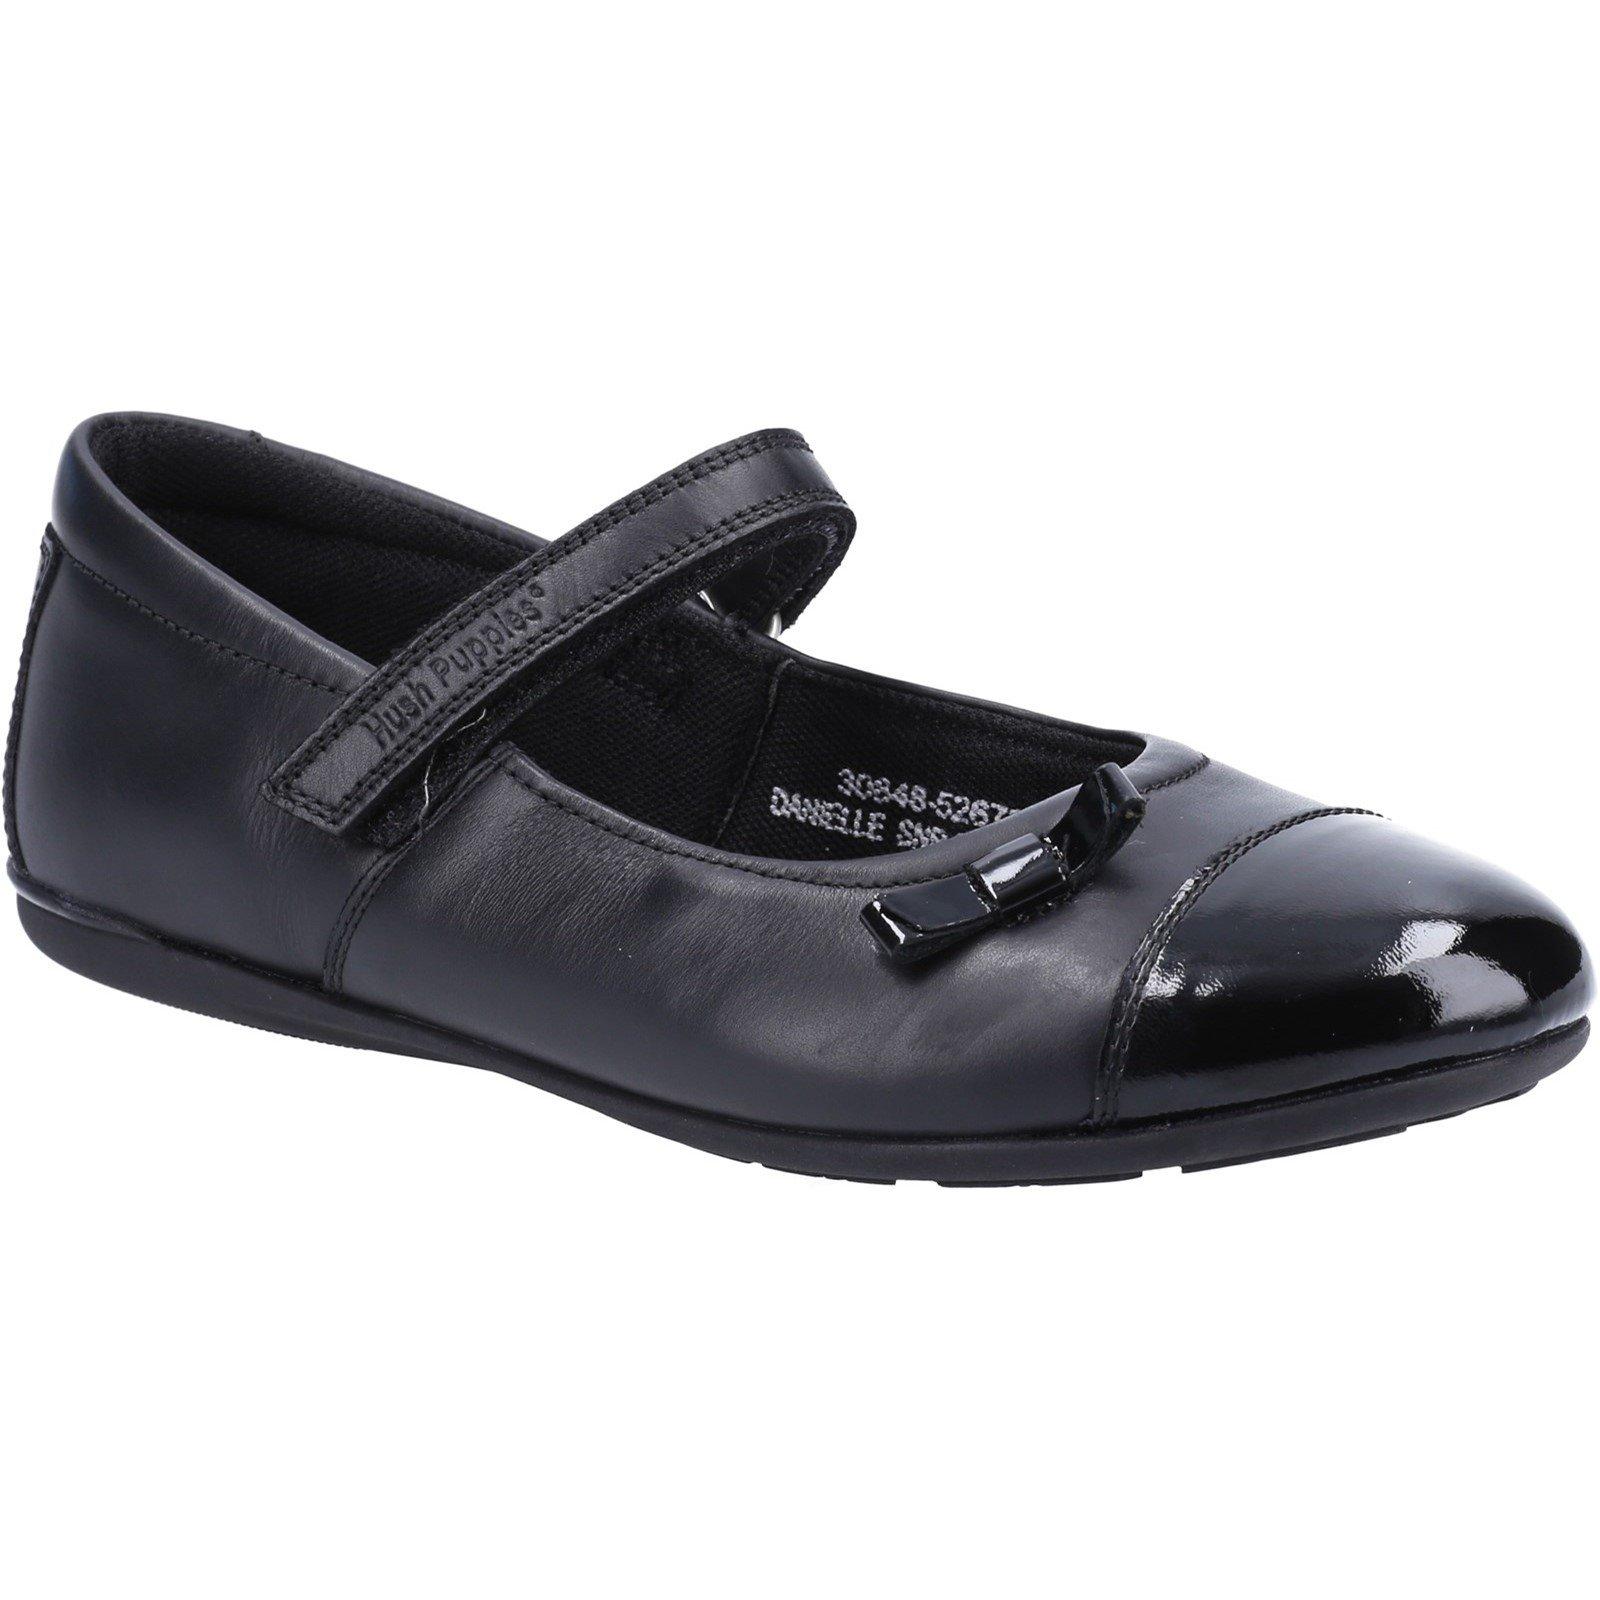 Hush Puppies Kid's Danielle Junior School Shoe Black 30847 - Black 12